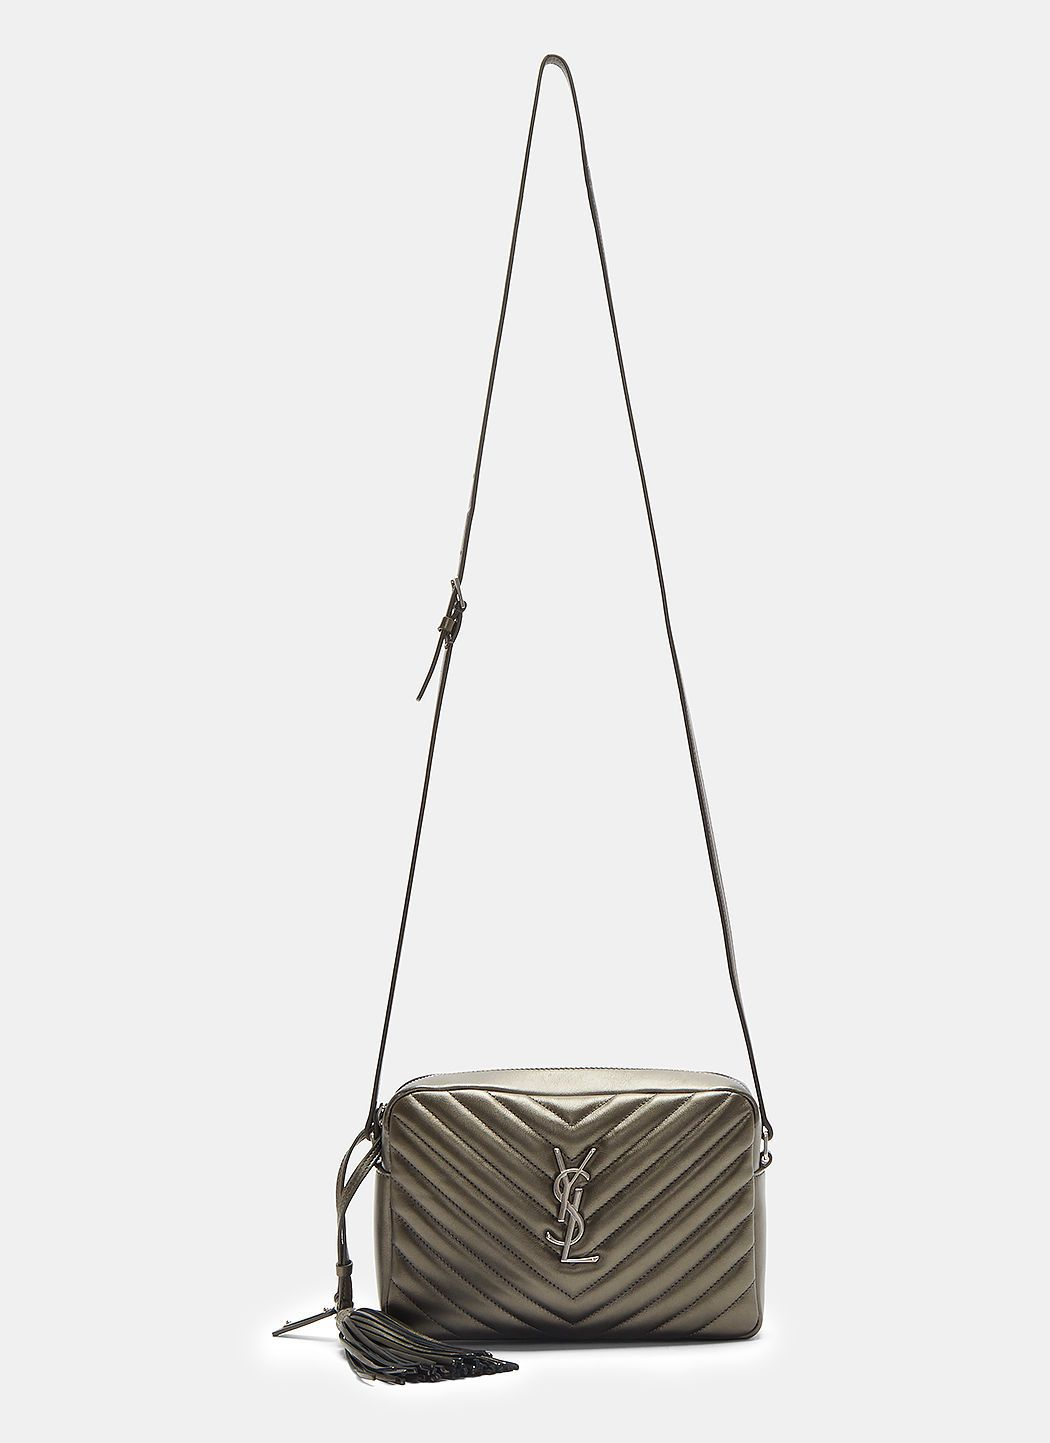 7d111c9f4fd97 SAINT LAURENT Small Lou Monogram Matelassé Camera Bag in Gunmetal. # saintlaurent #bags #shoulder bags #leather #charm #accessories #